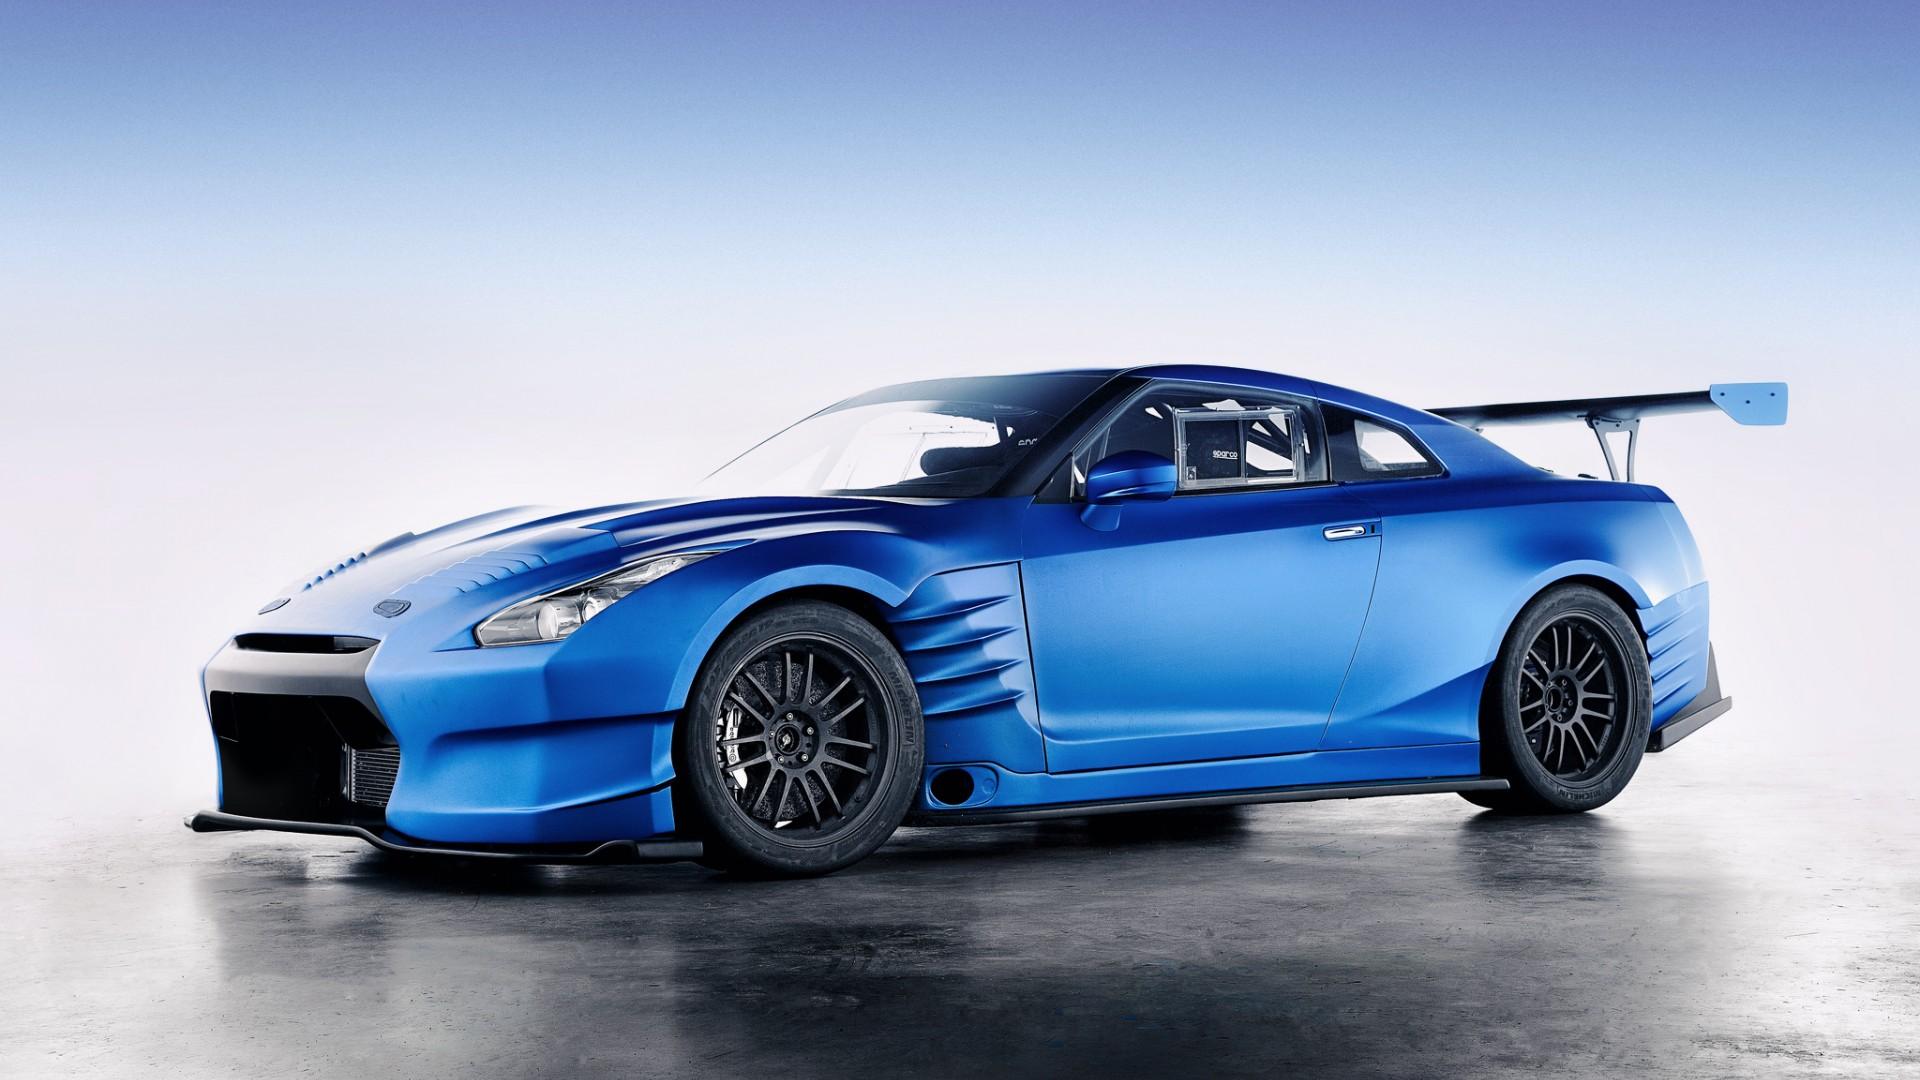 Nissan nissan deportivos nissan gt r nissan gt r r35 tuning cars - Imagenes Nissan Gt R R35